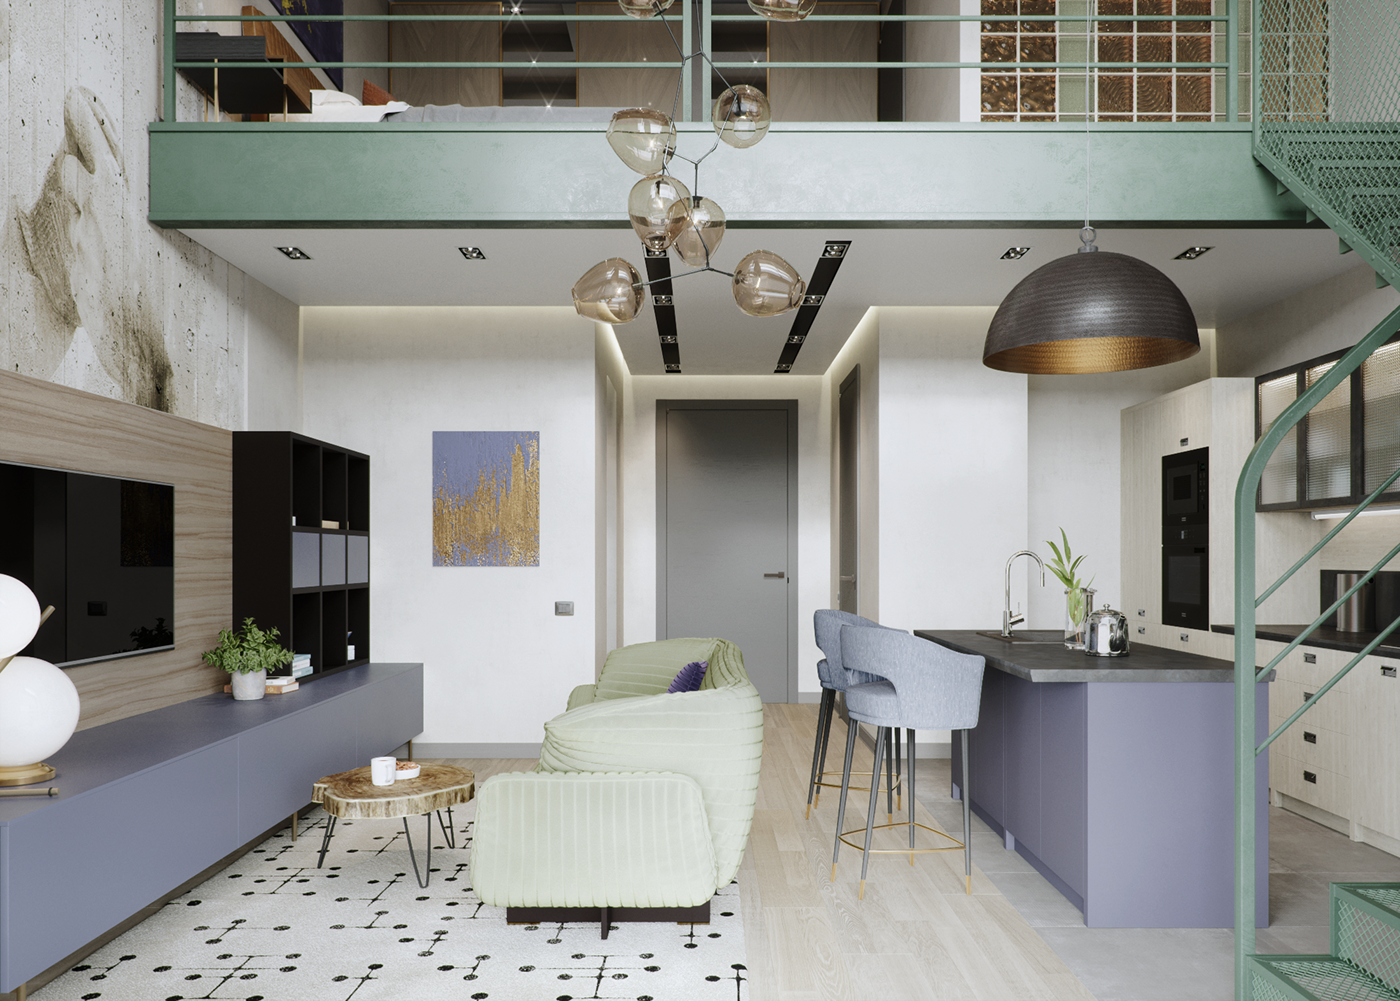 Tribeca apartment house on Behance